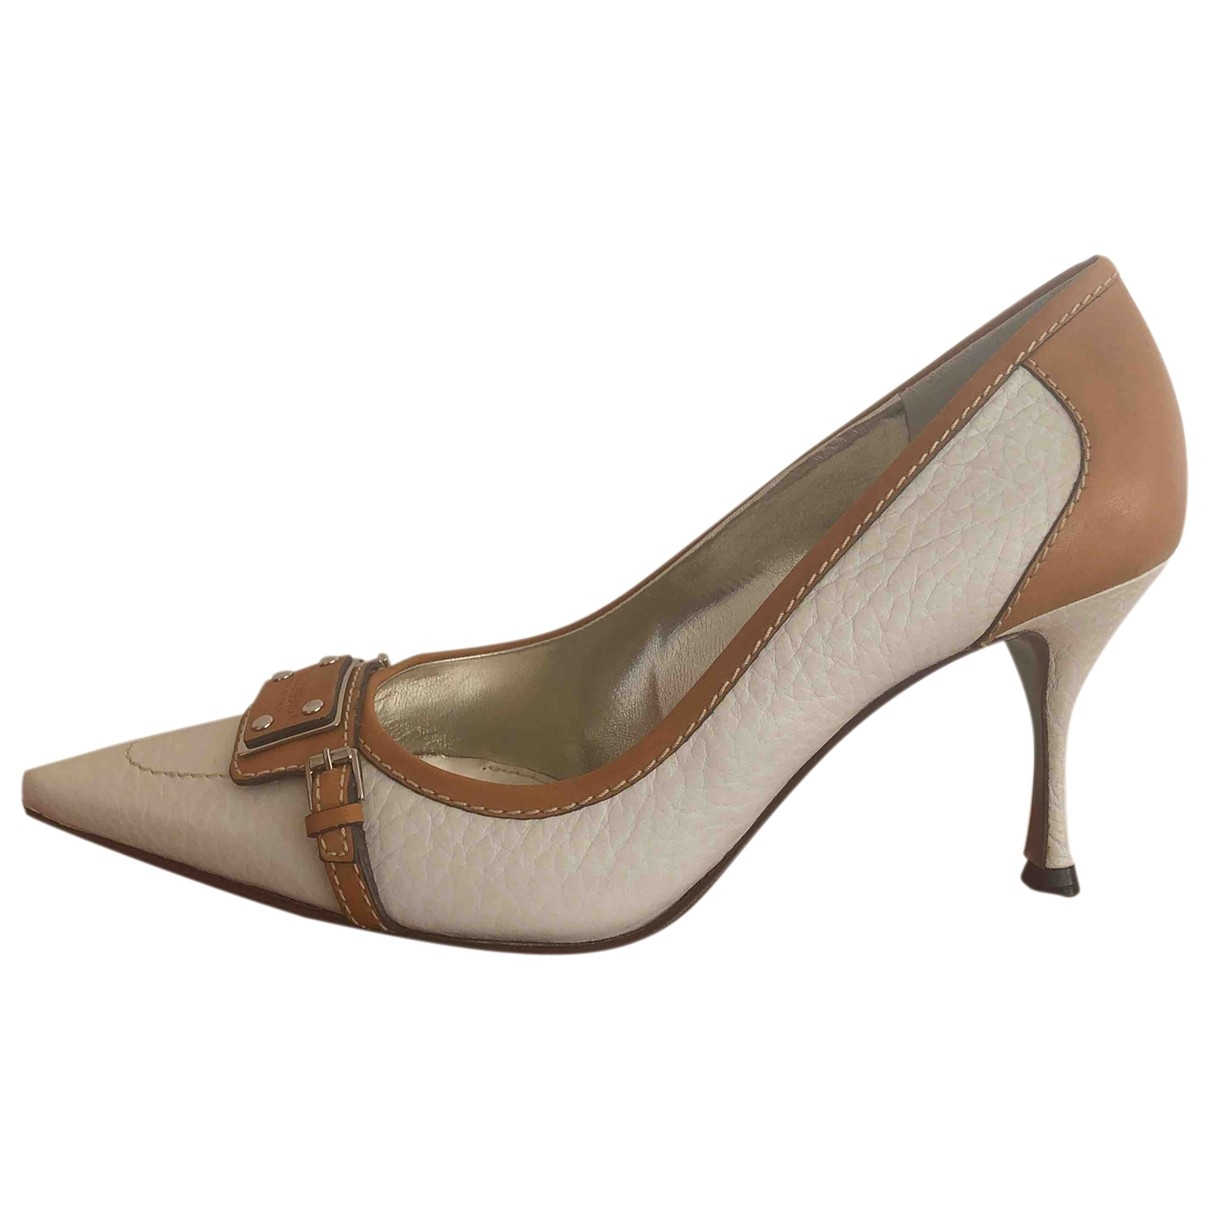 Dolce & Gabbana \N White Leather Heels for Women 38.5 EU